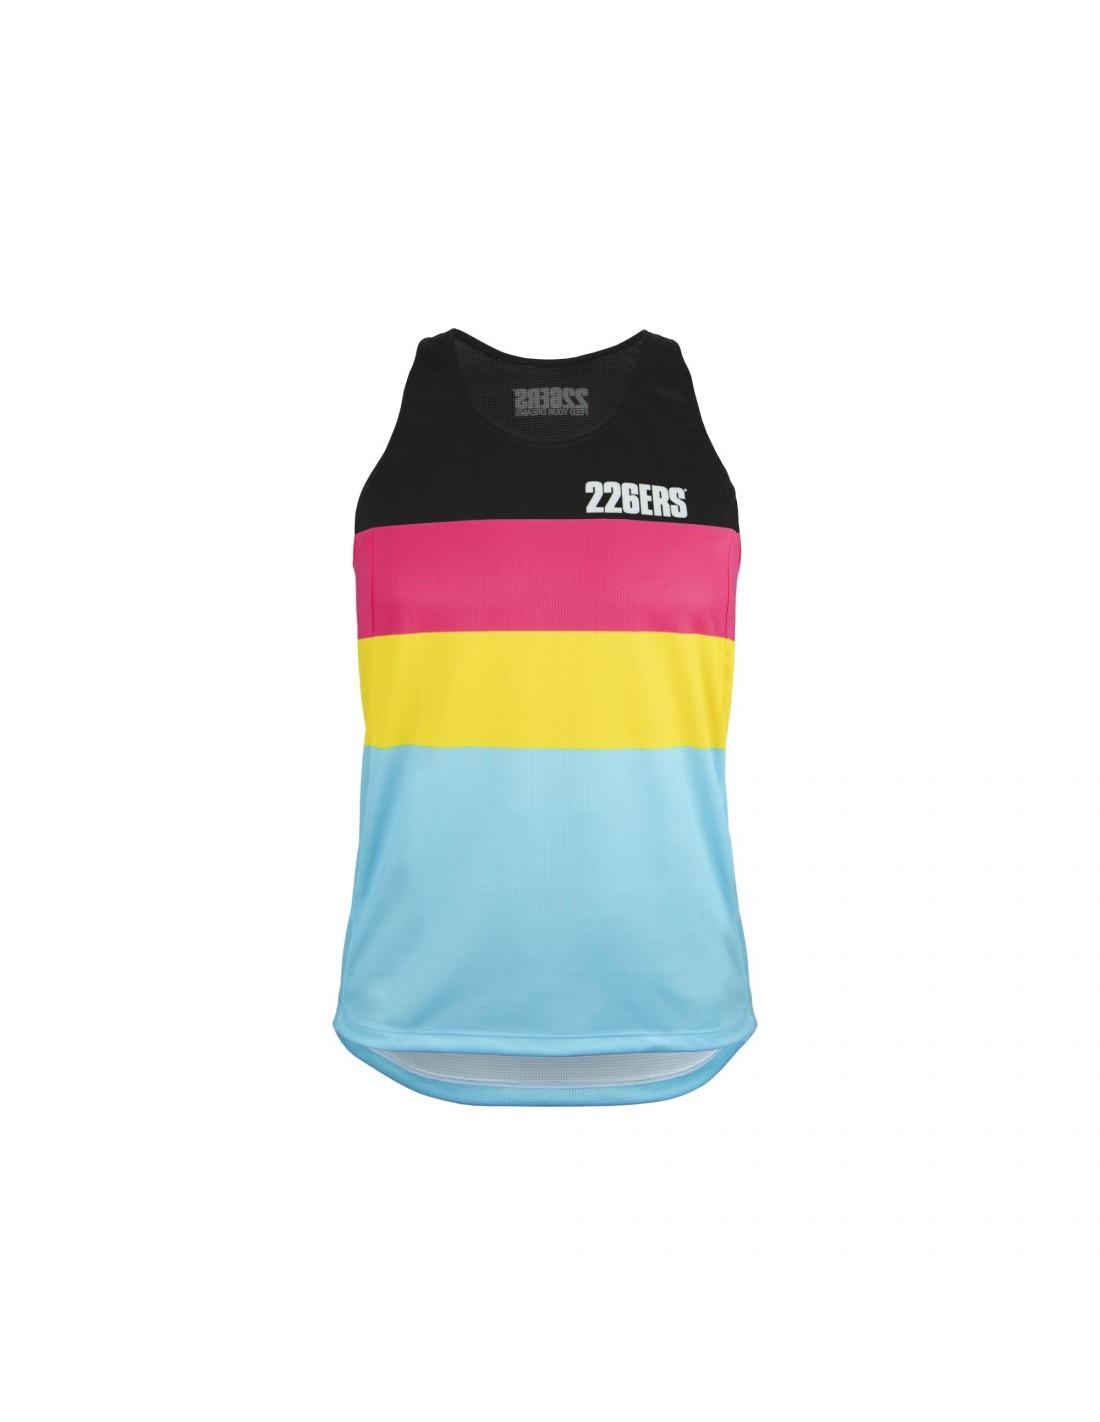 Camiseta Hidrazero Black Asillas · Producto 226ers · Textil Running · Kukimbia Shop - Tienda Online